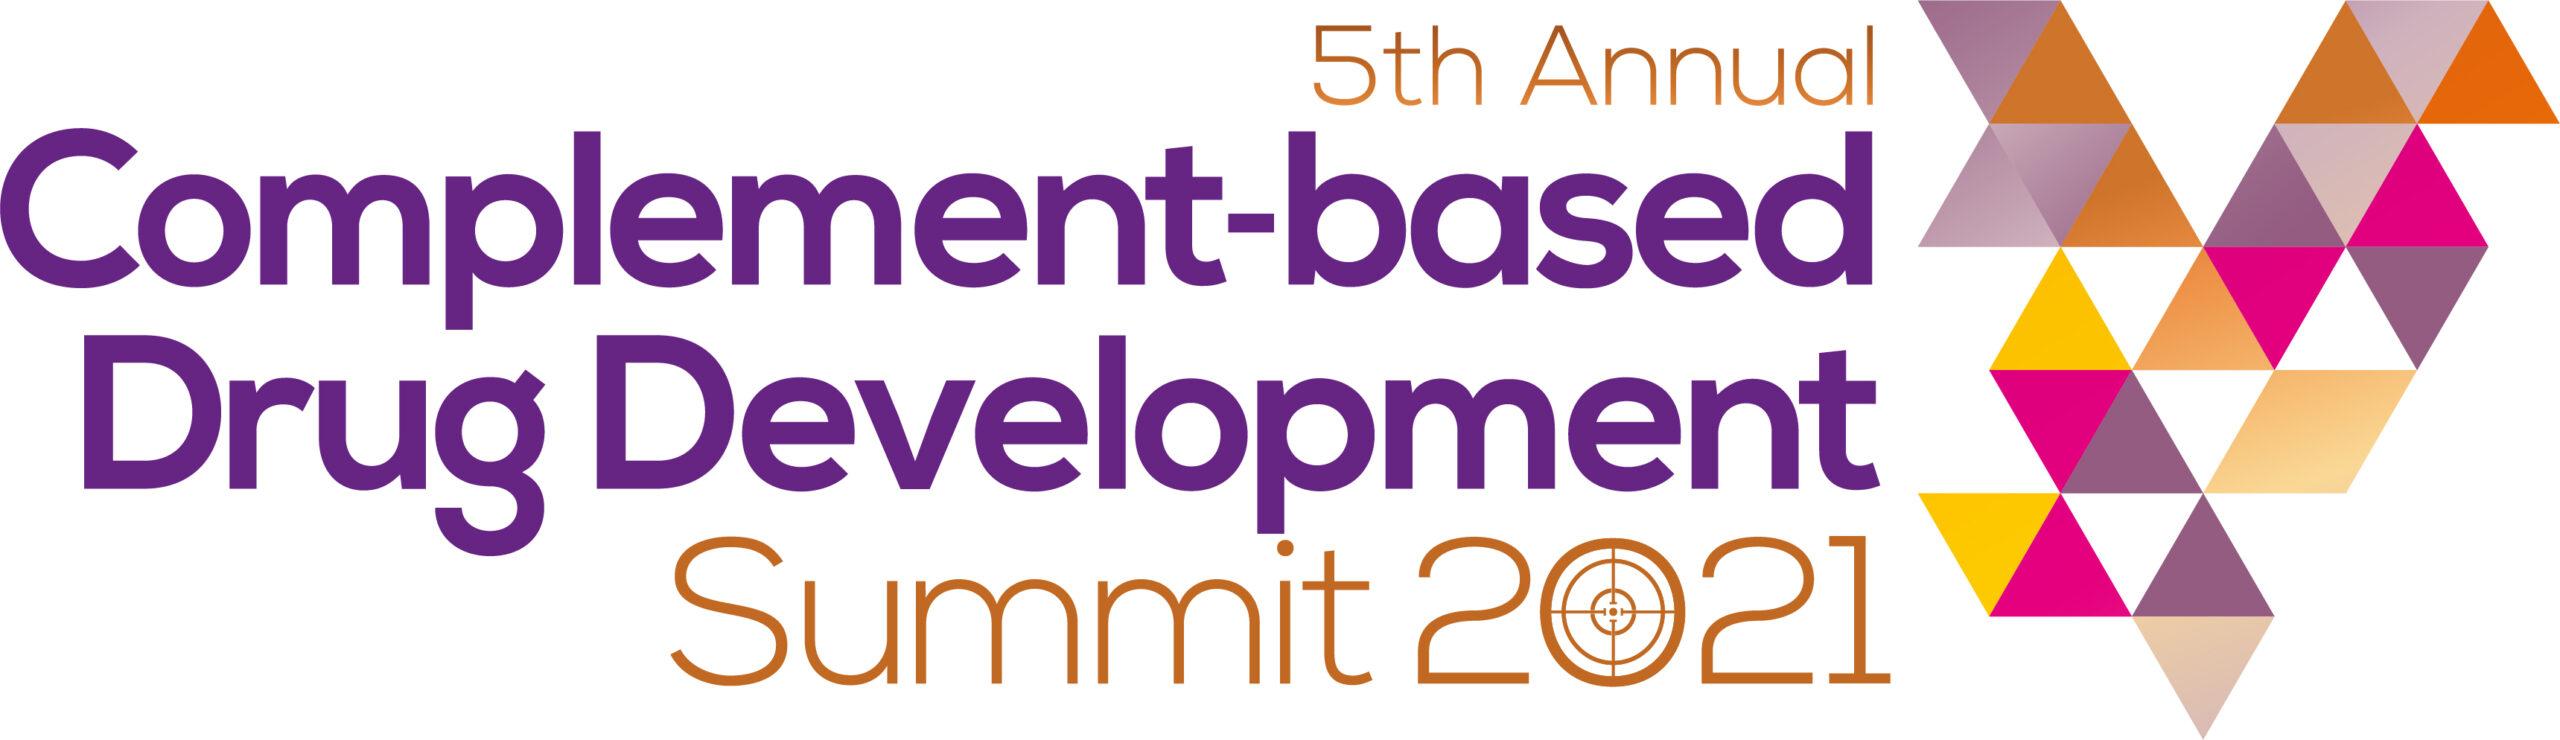 HW200427 Complement based Drug Development Summit logo 2021